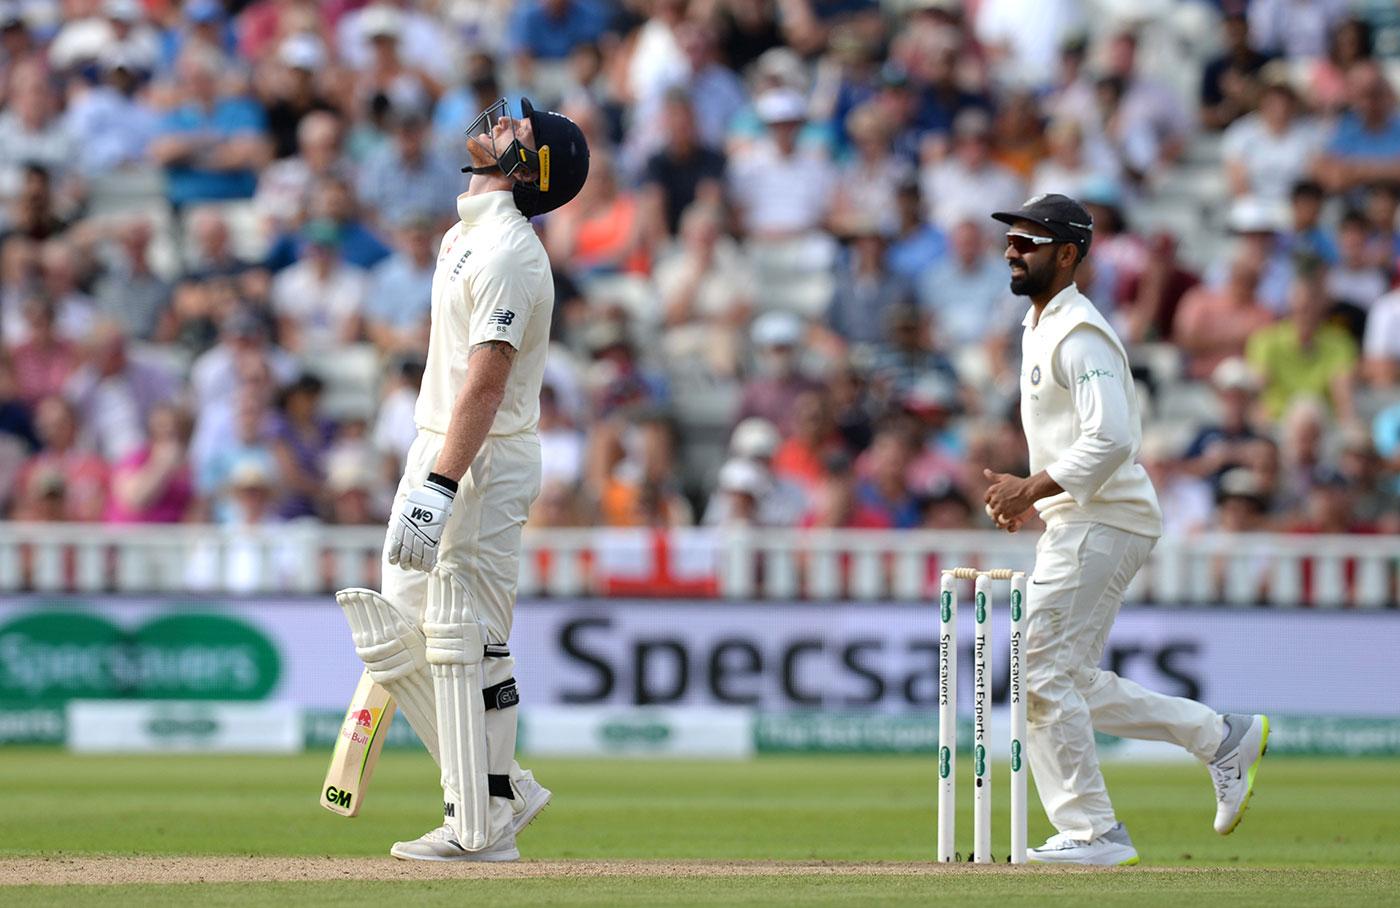 England vs India, Trevor Bayliss, Ben Stokes